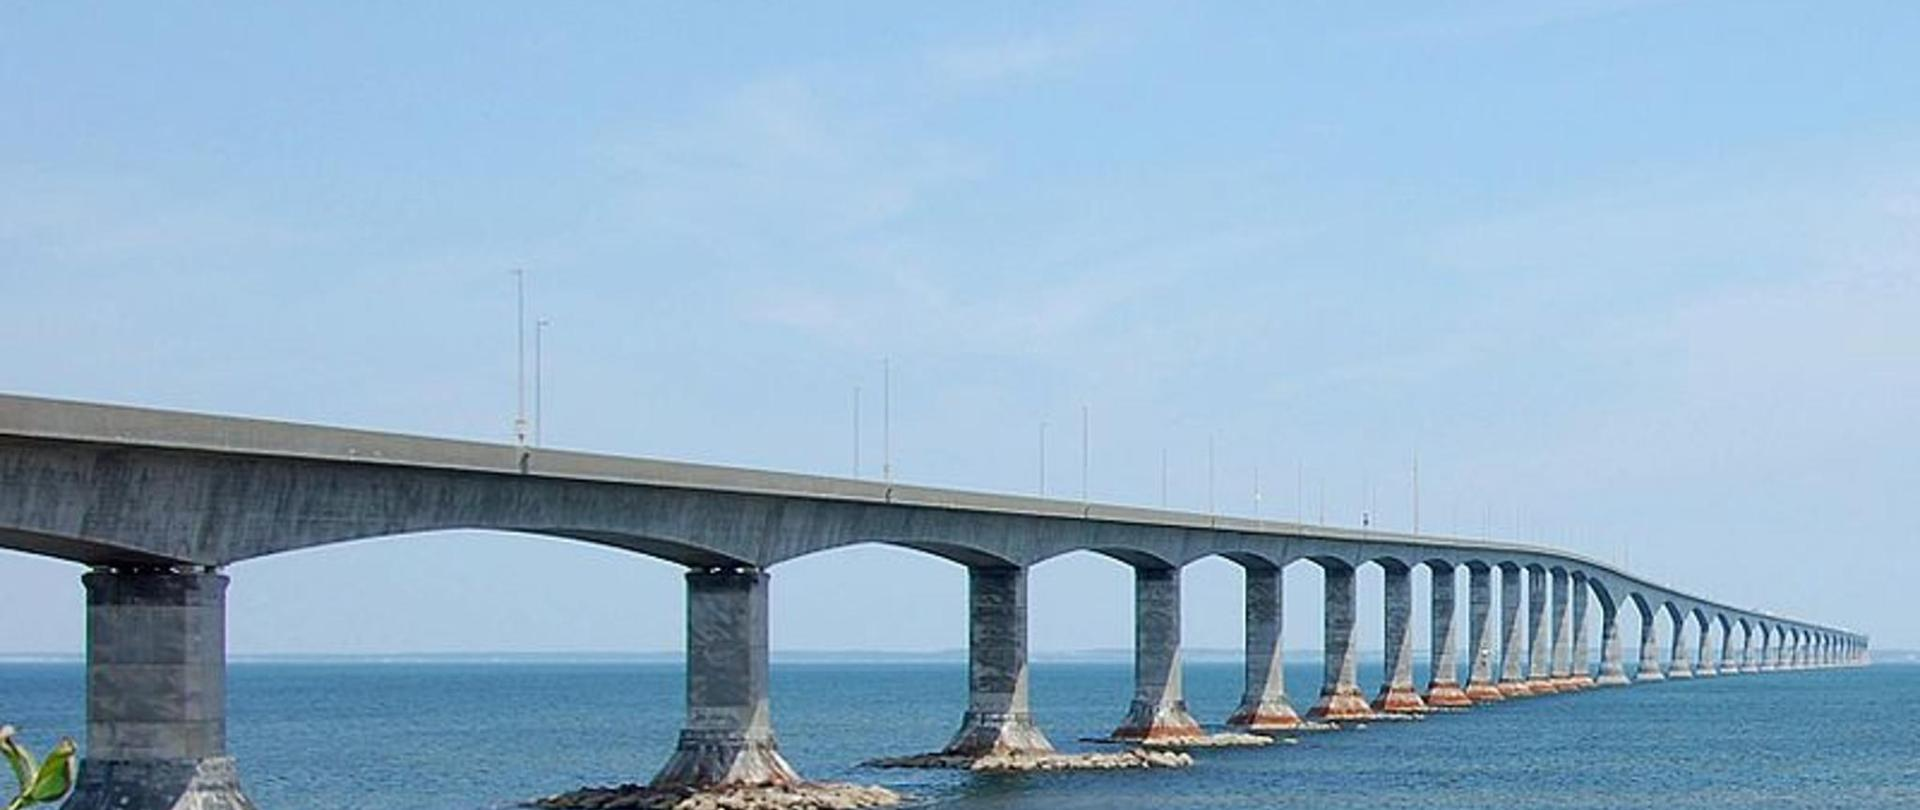 800px-confederation_bridge-2.jpg